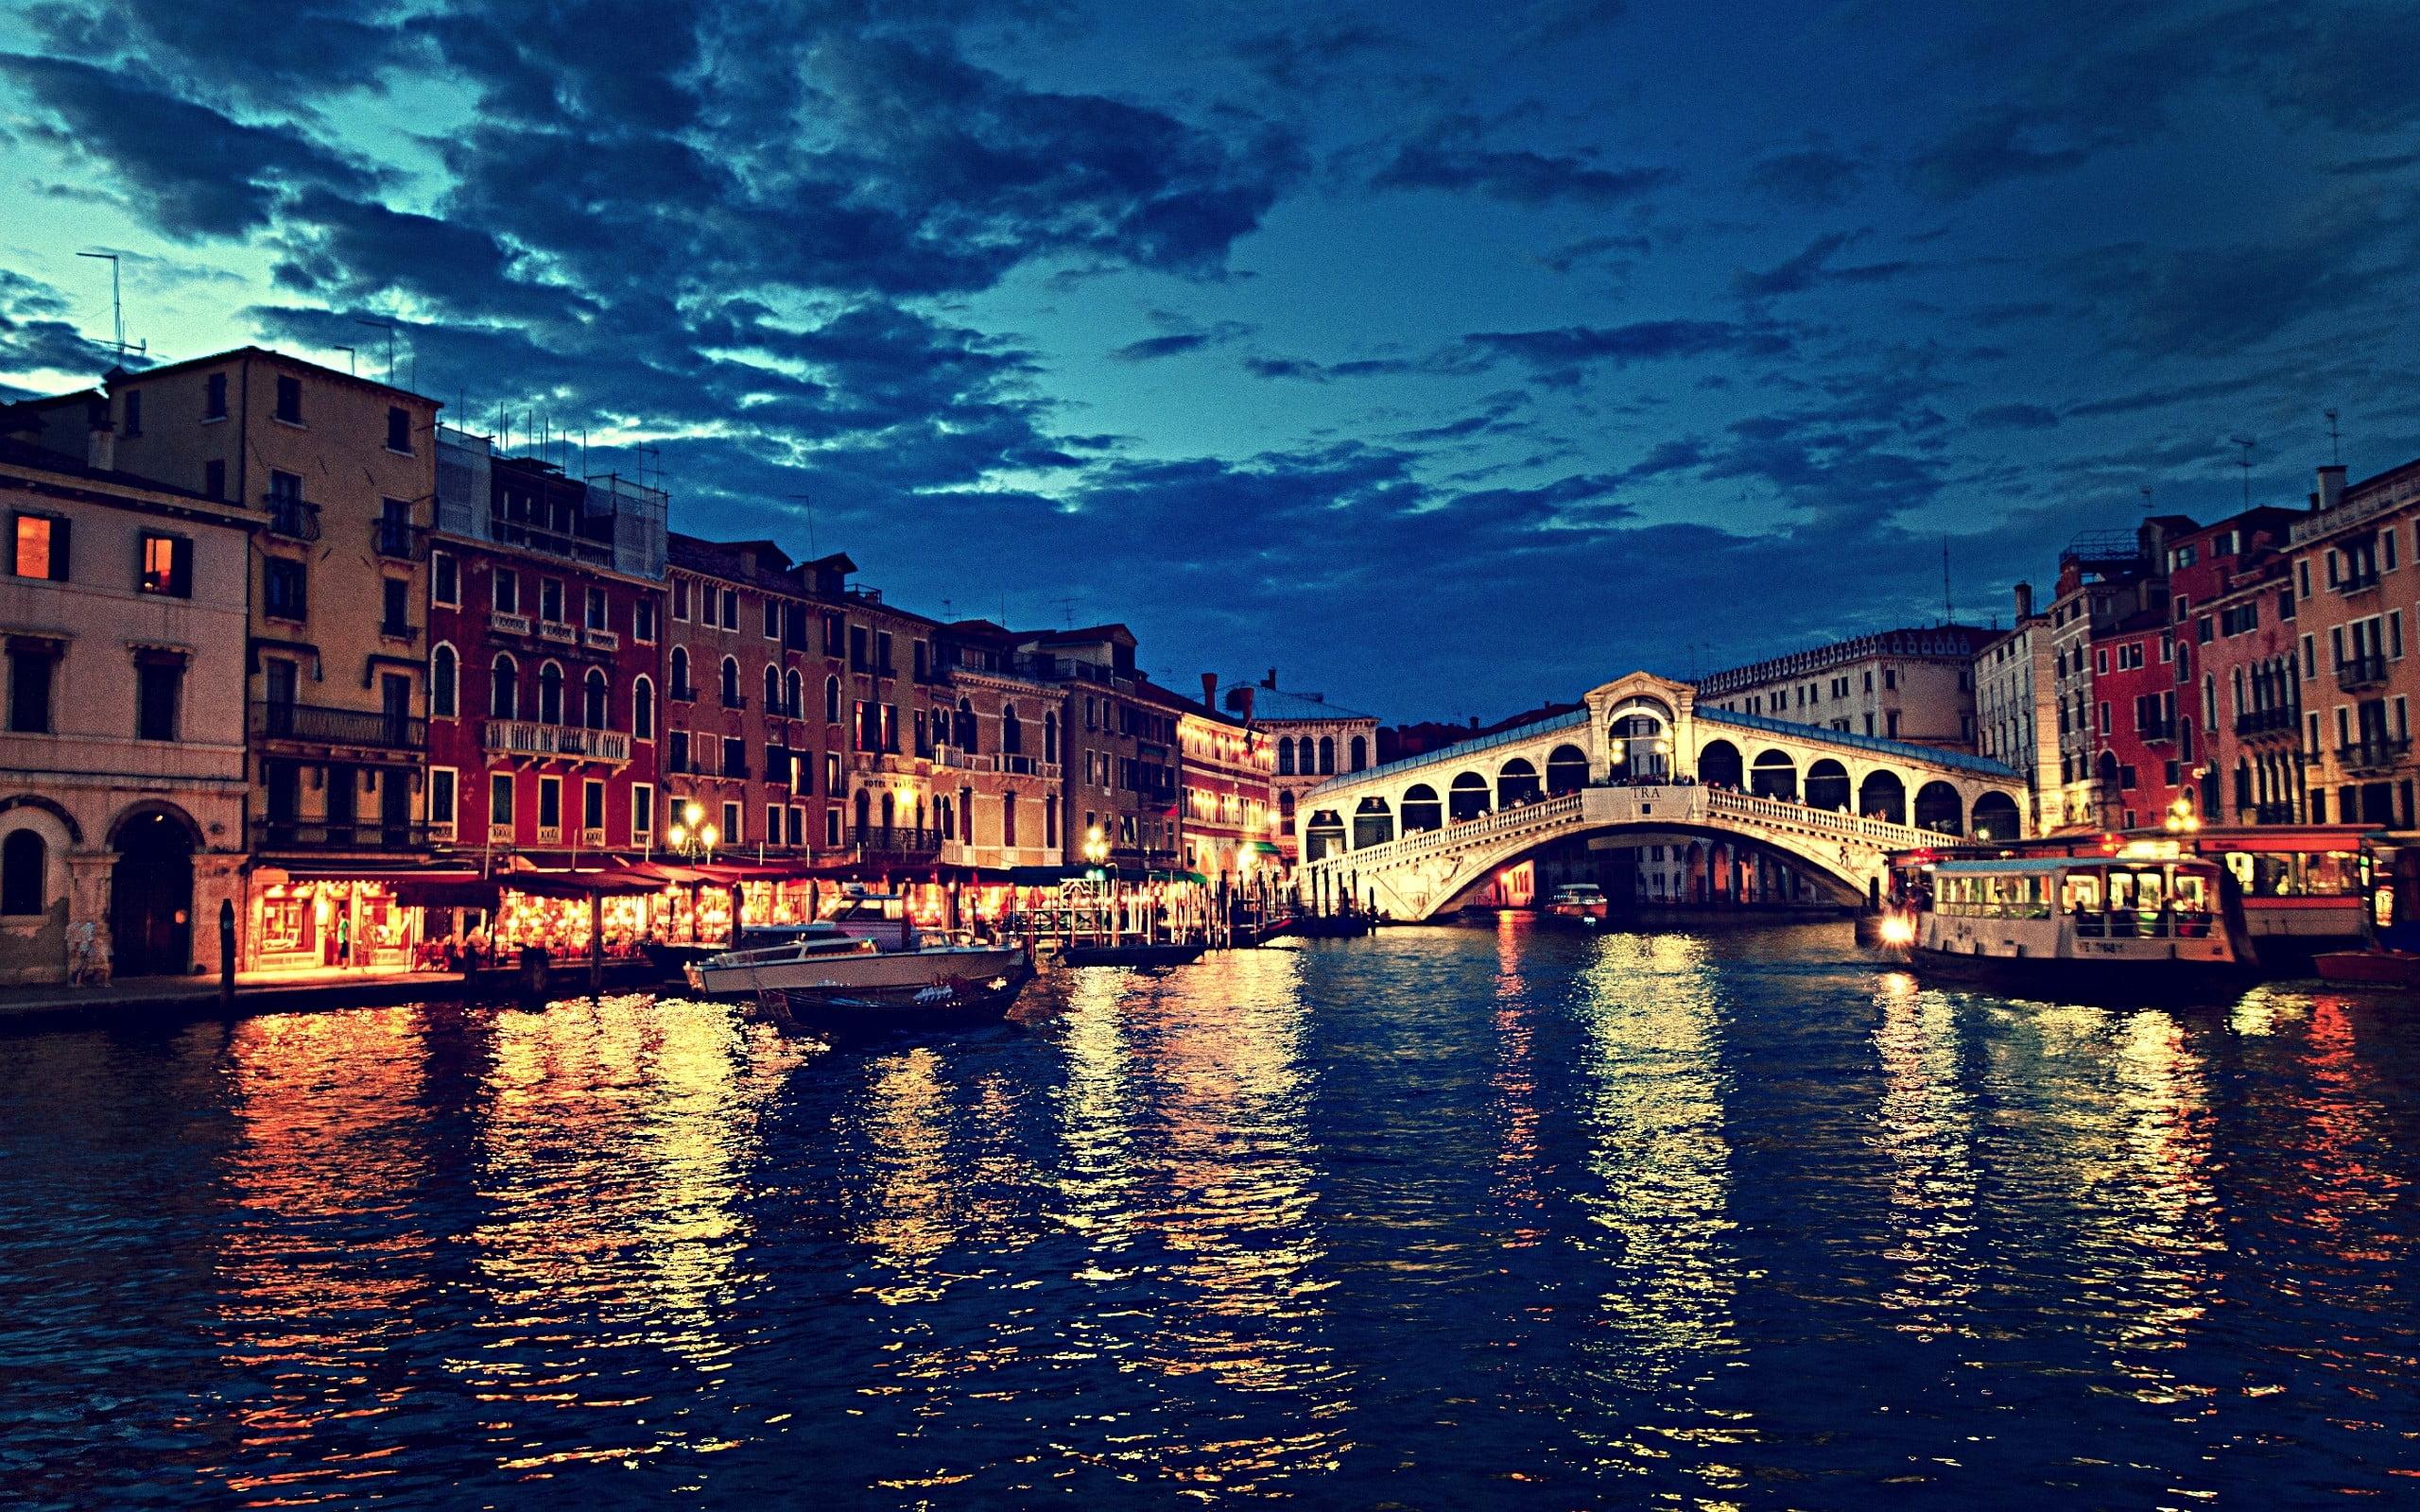 Venice Italy HD wallpaper Wallpaper Flare 2560x1600